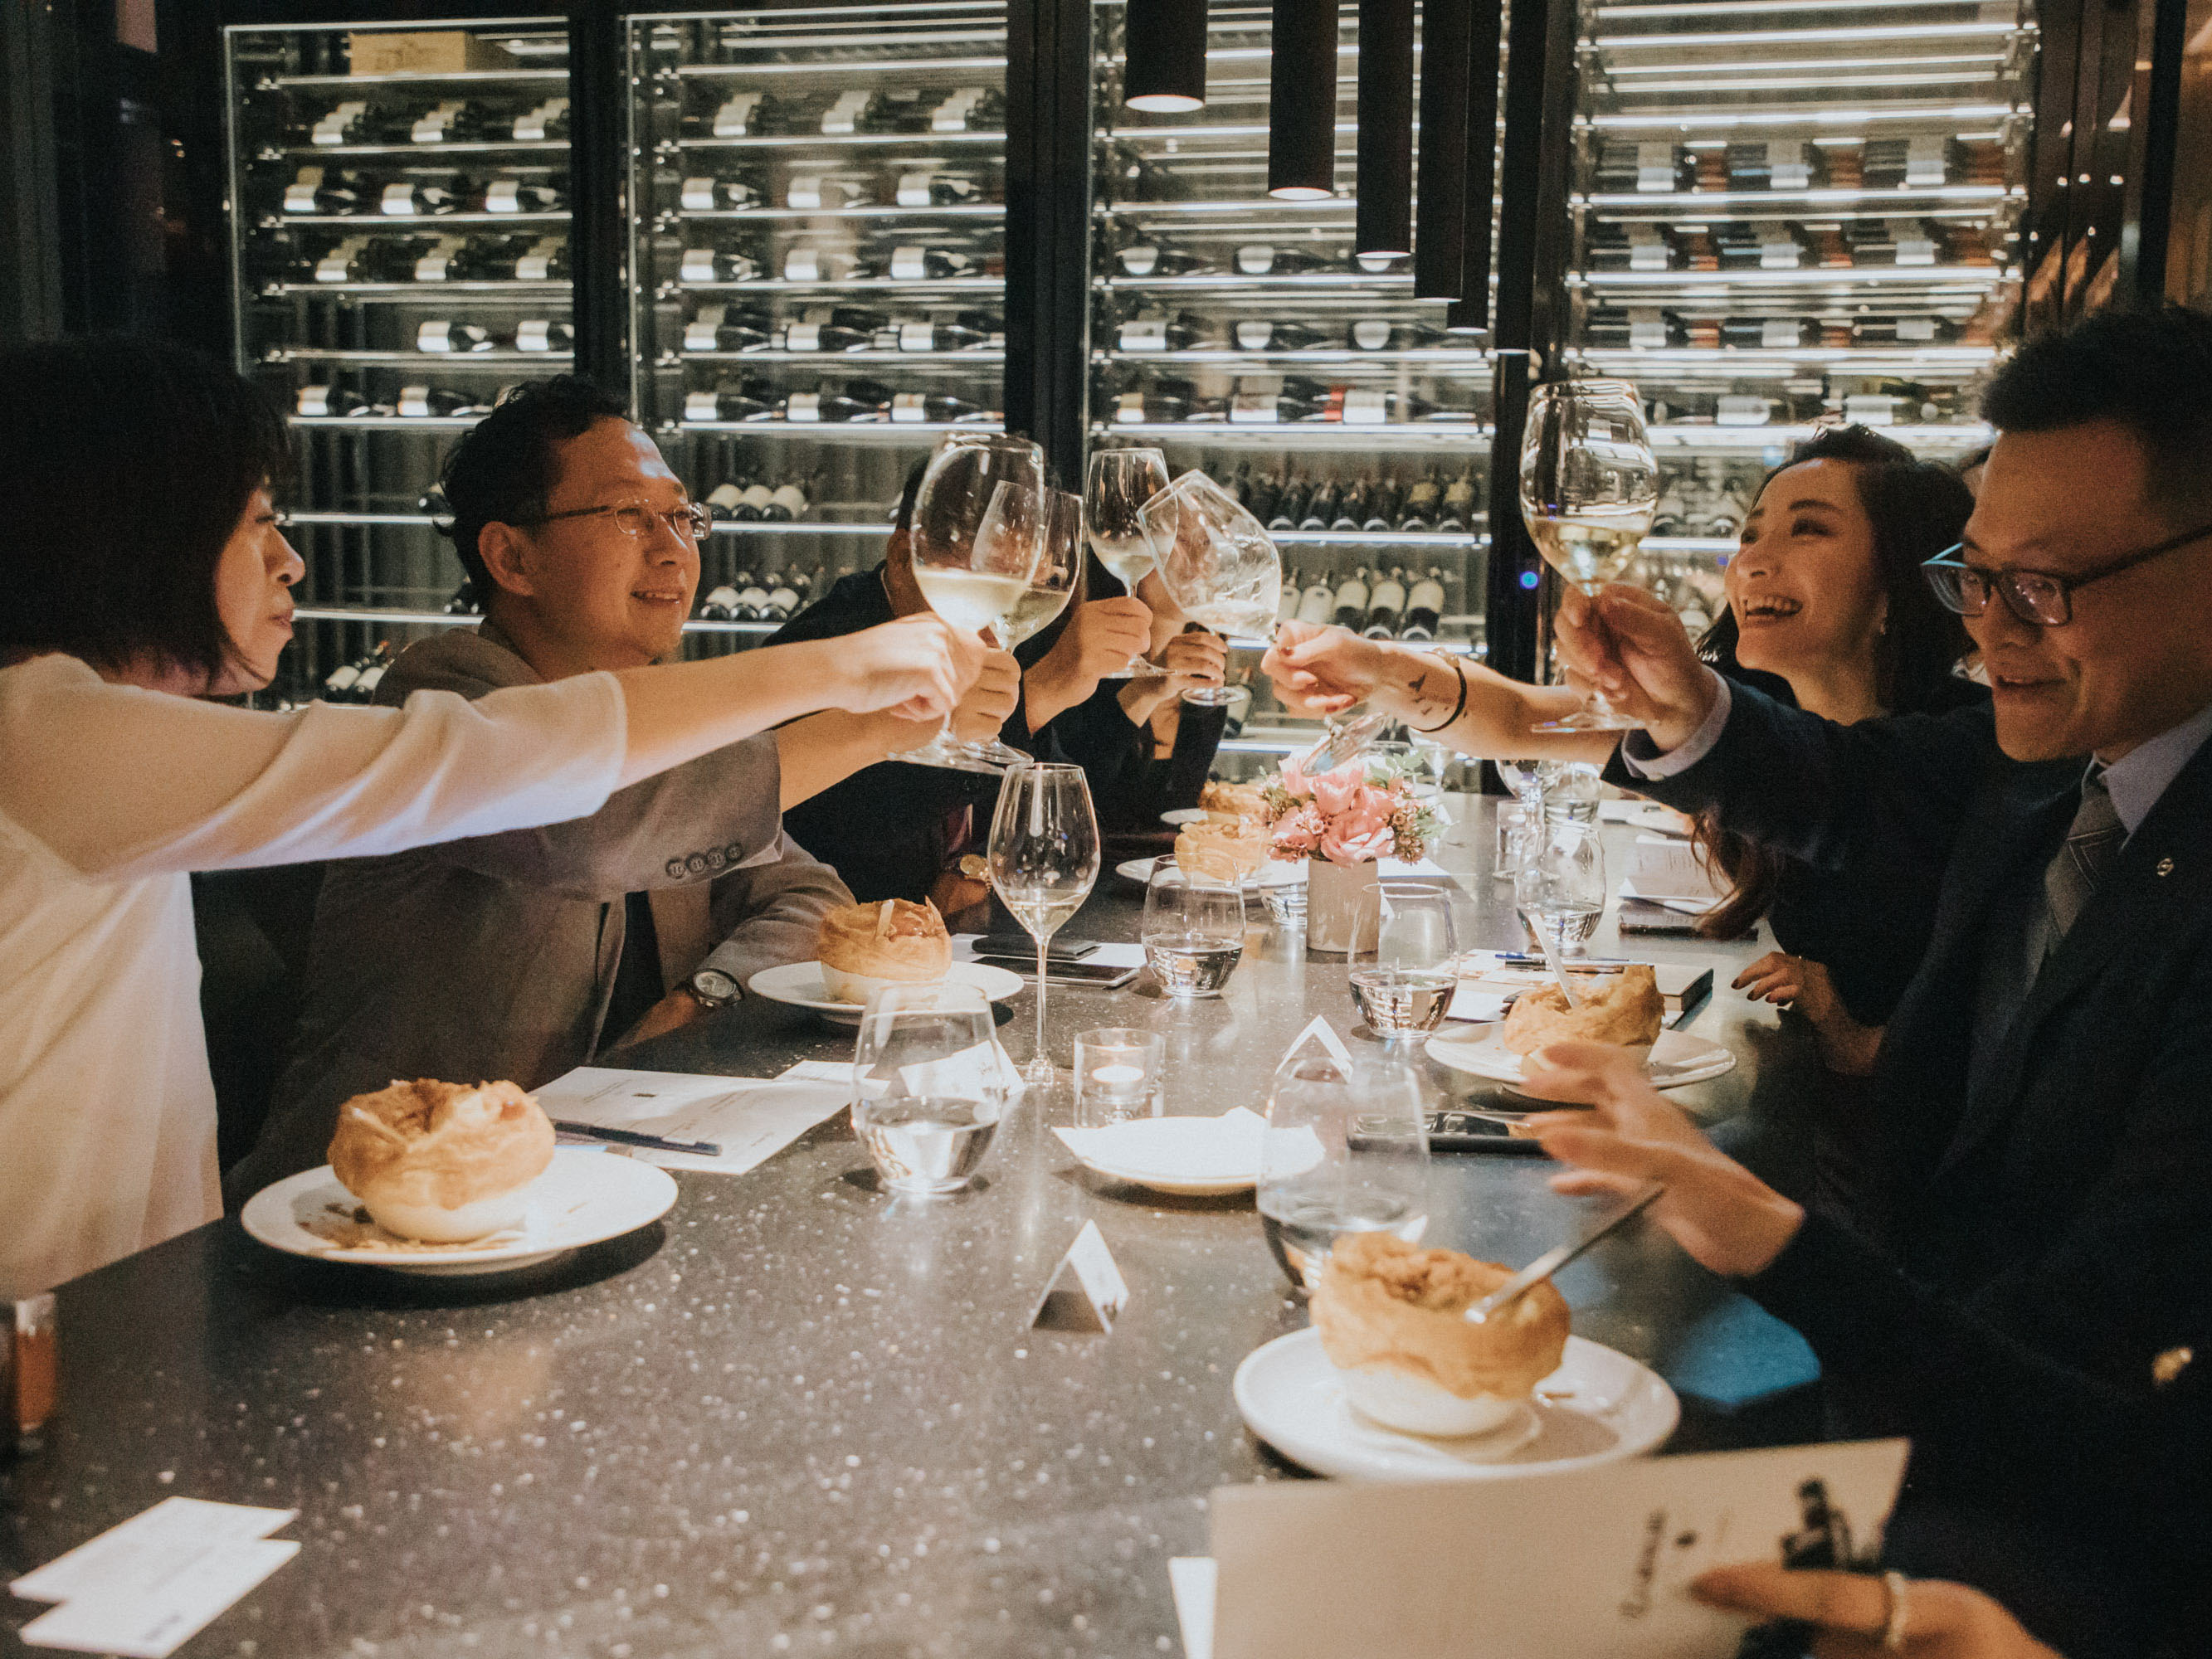 Lexus|Dining Out 國際頂尖雙廚聯彈